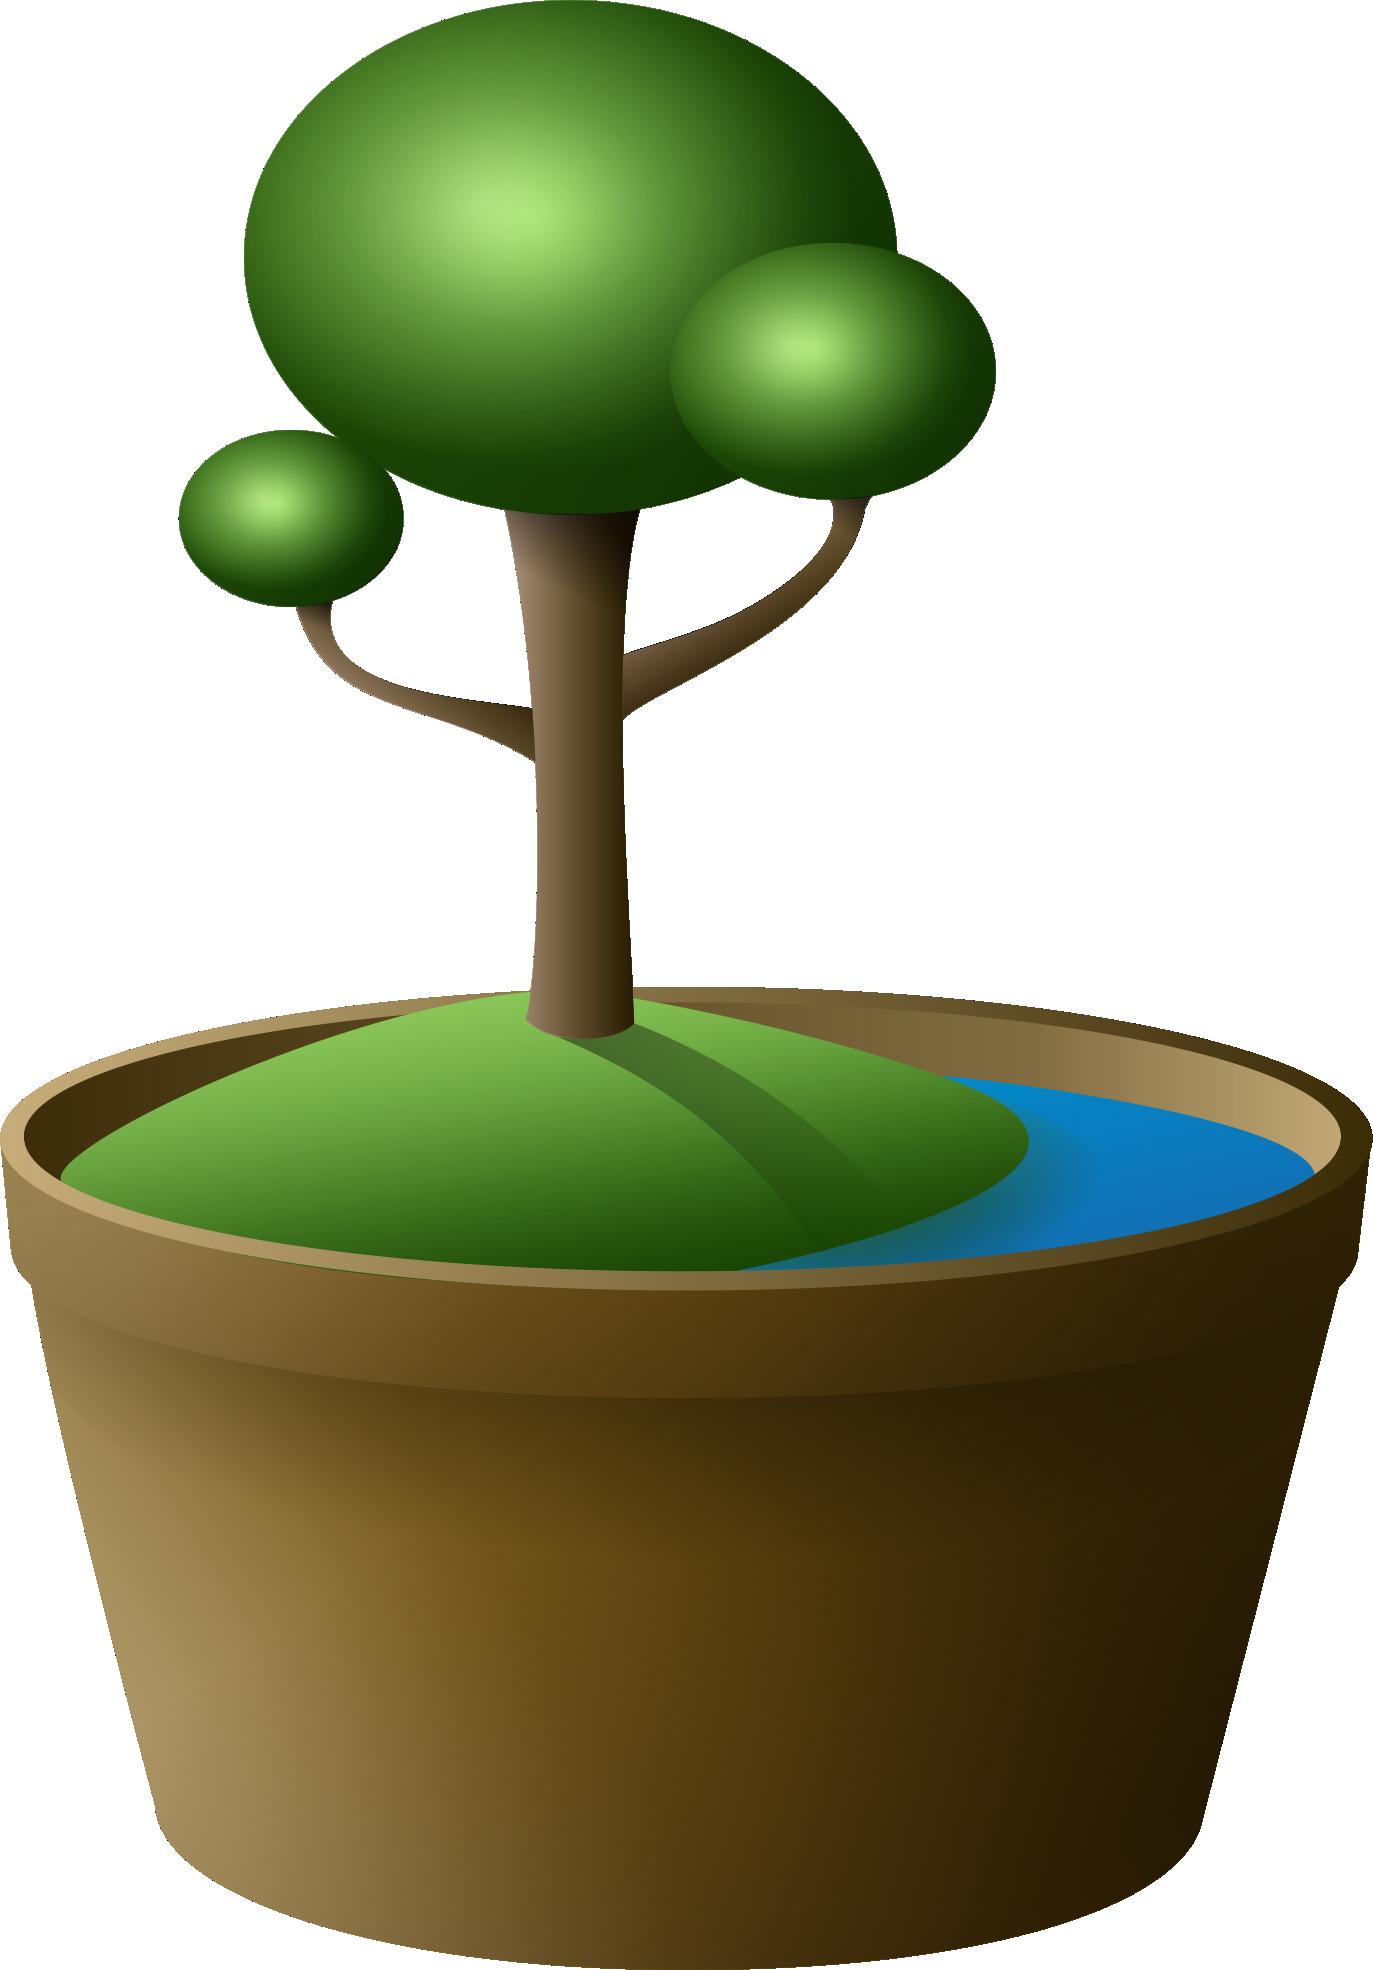 Cartoon Bonsai Tree Clipart Free Image